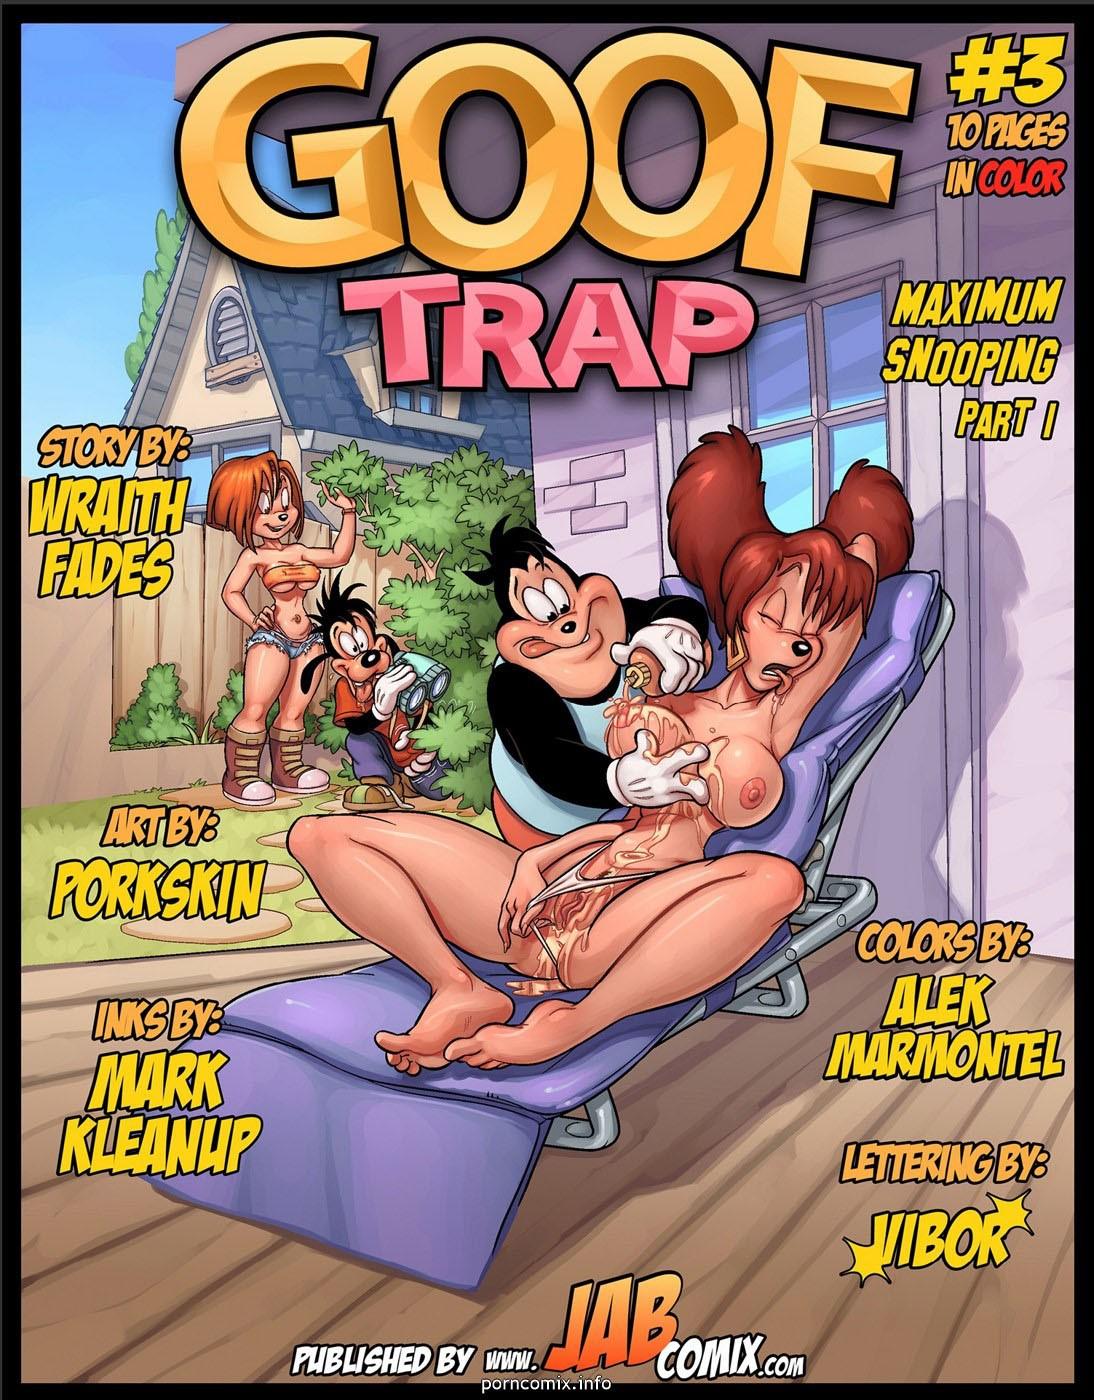 Pagina Porno De Incesto goof trap 3 - chochox - comics porno